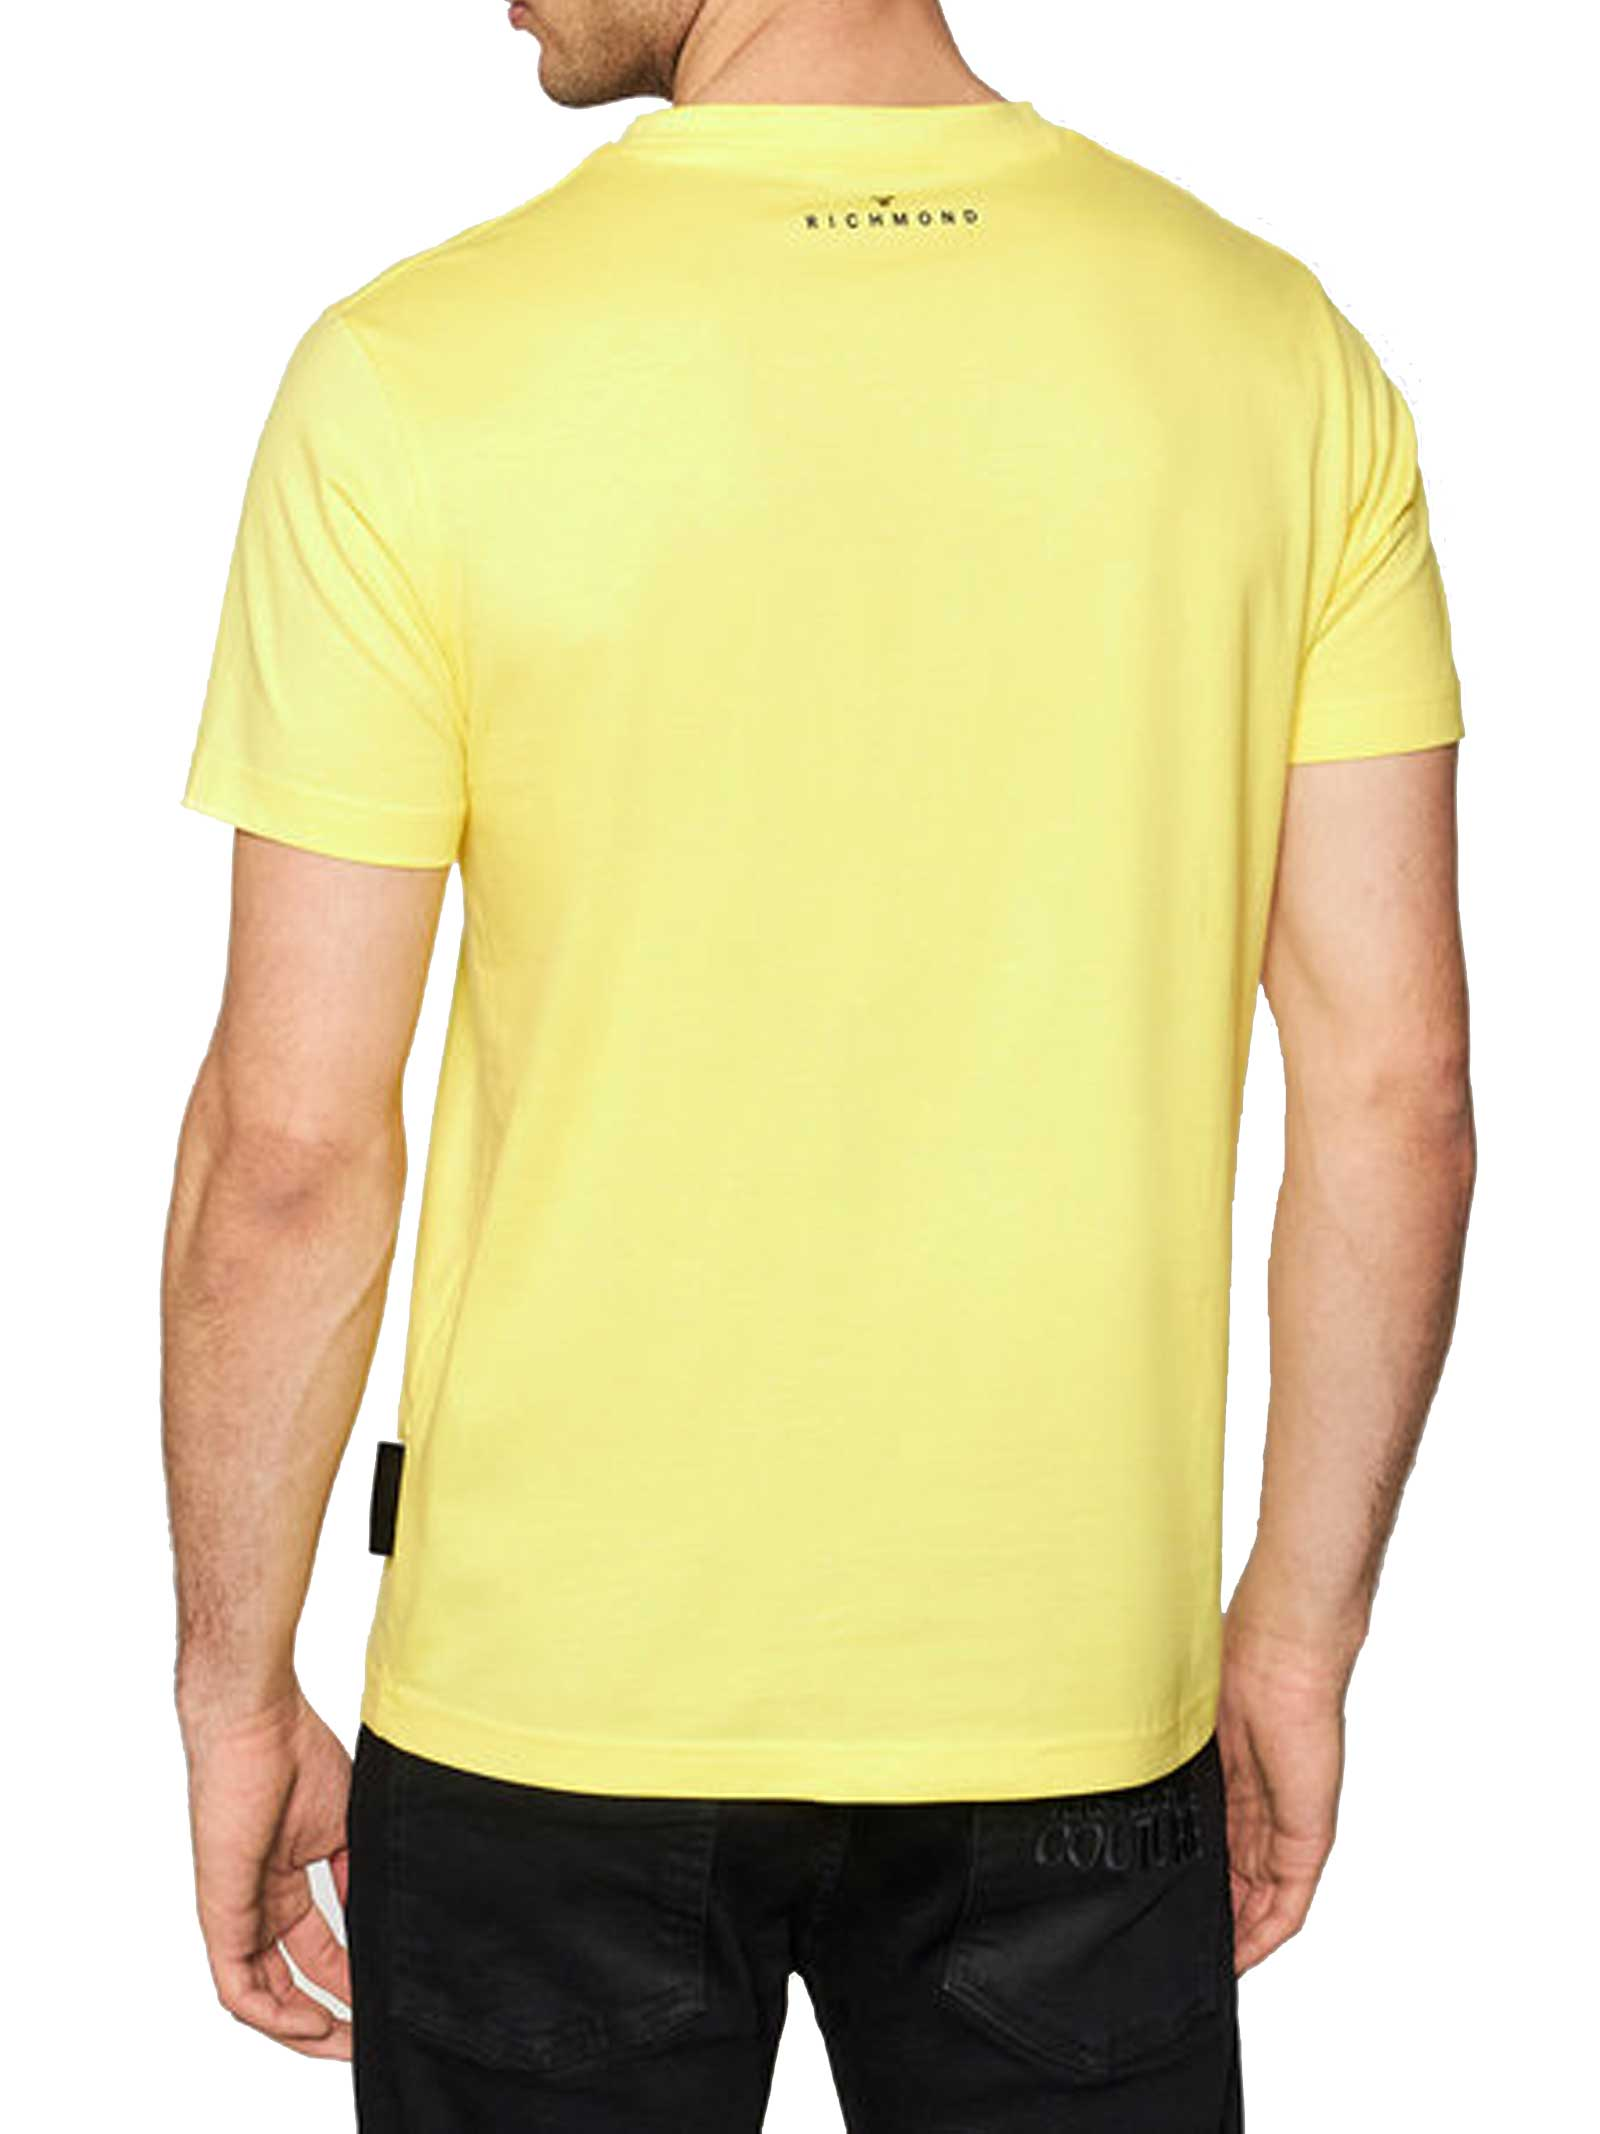 T-SHIRT UOMO JOHN RICHMOND   T-shirt   UMP21004TSLIME CELANDINE